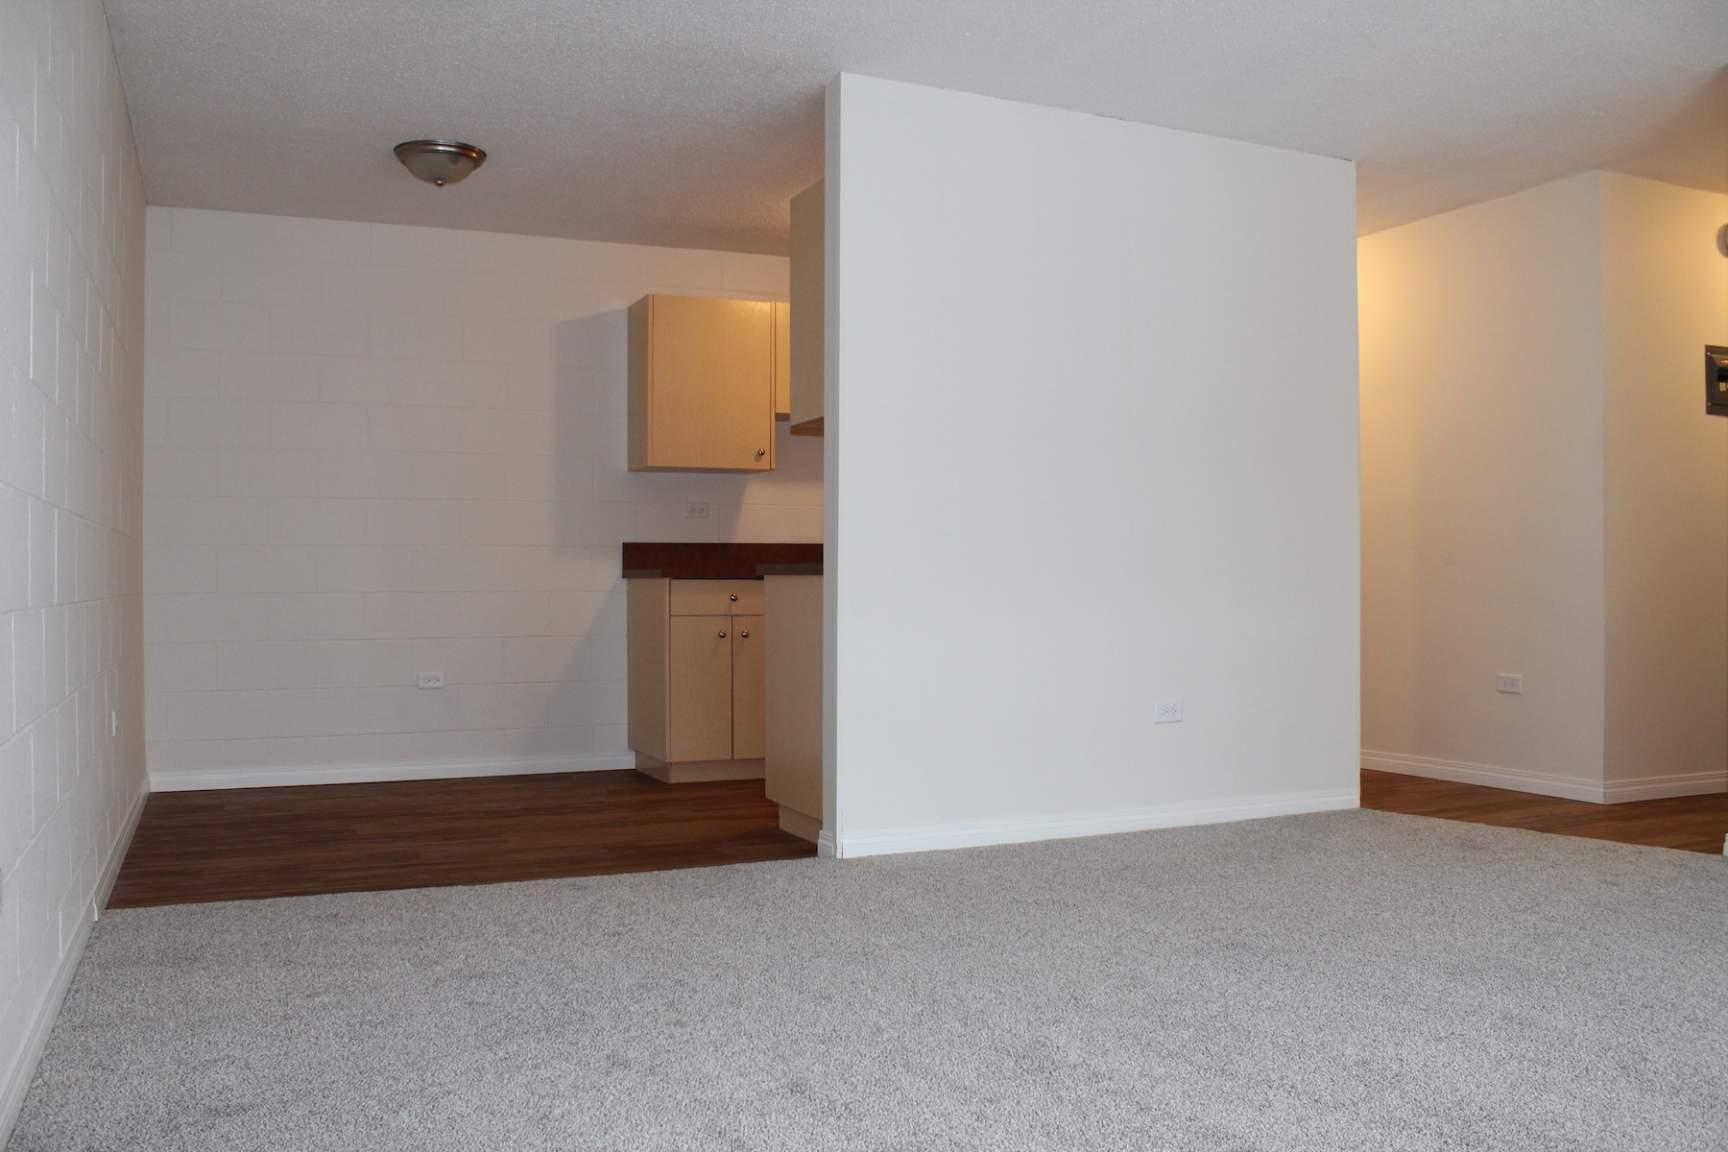 3908 16 St SW, Calgary, AB - $975